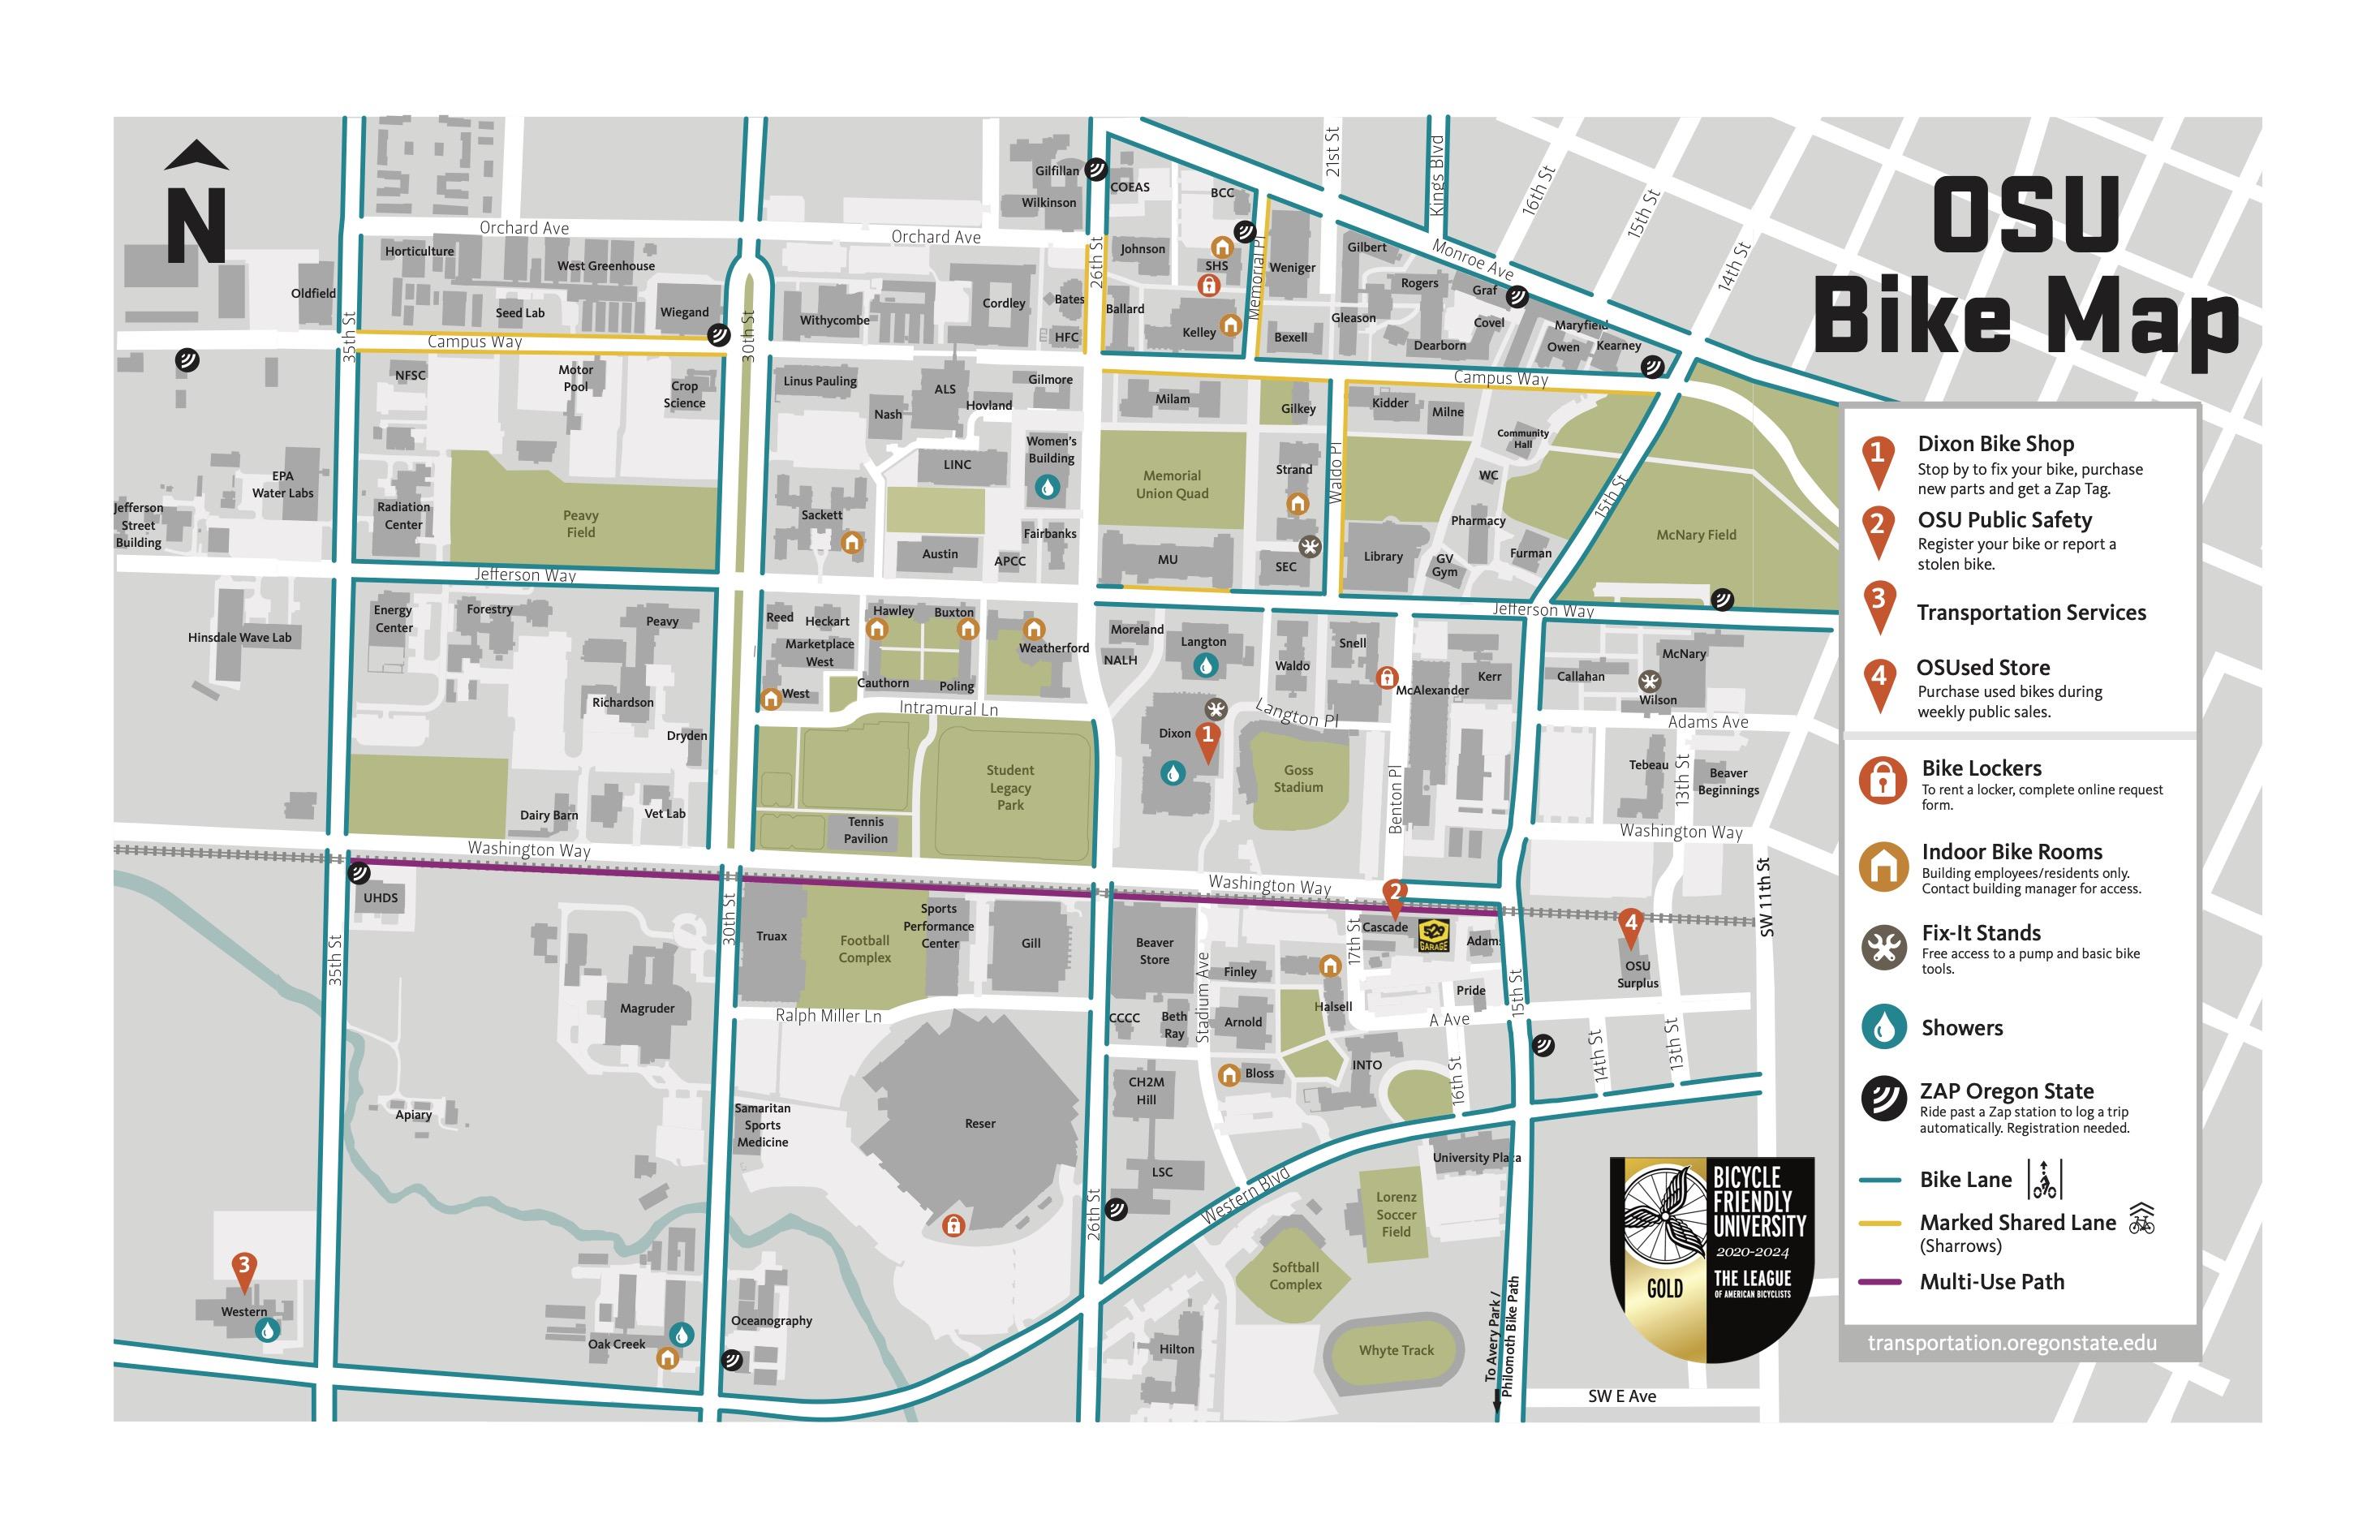 Bike Resource map for OSU